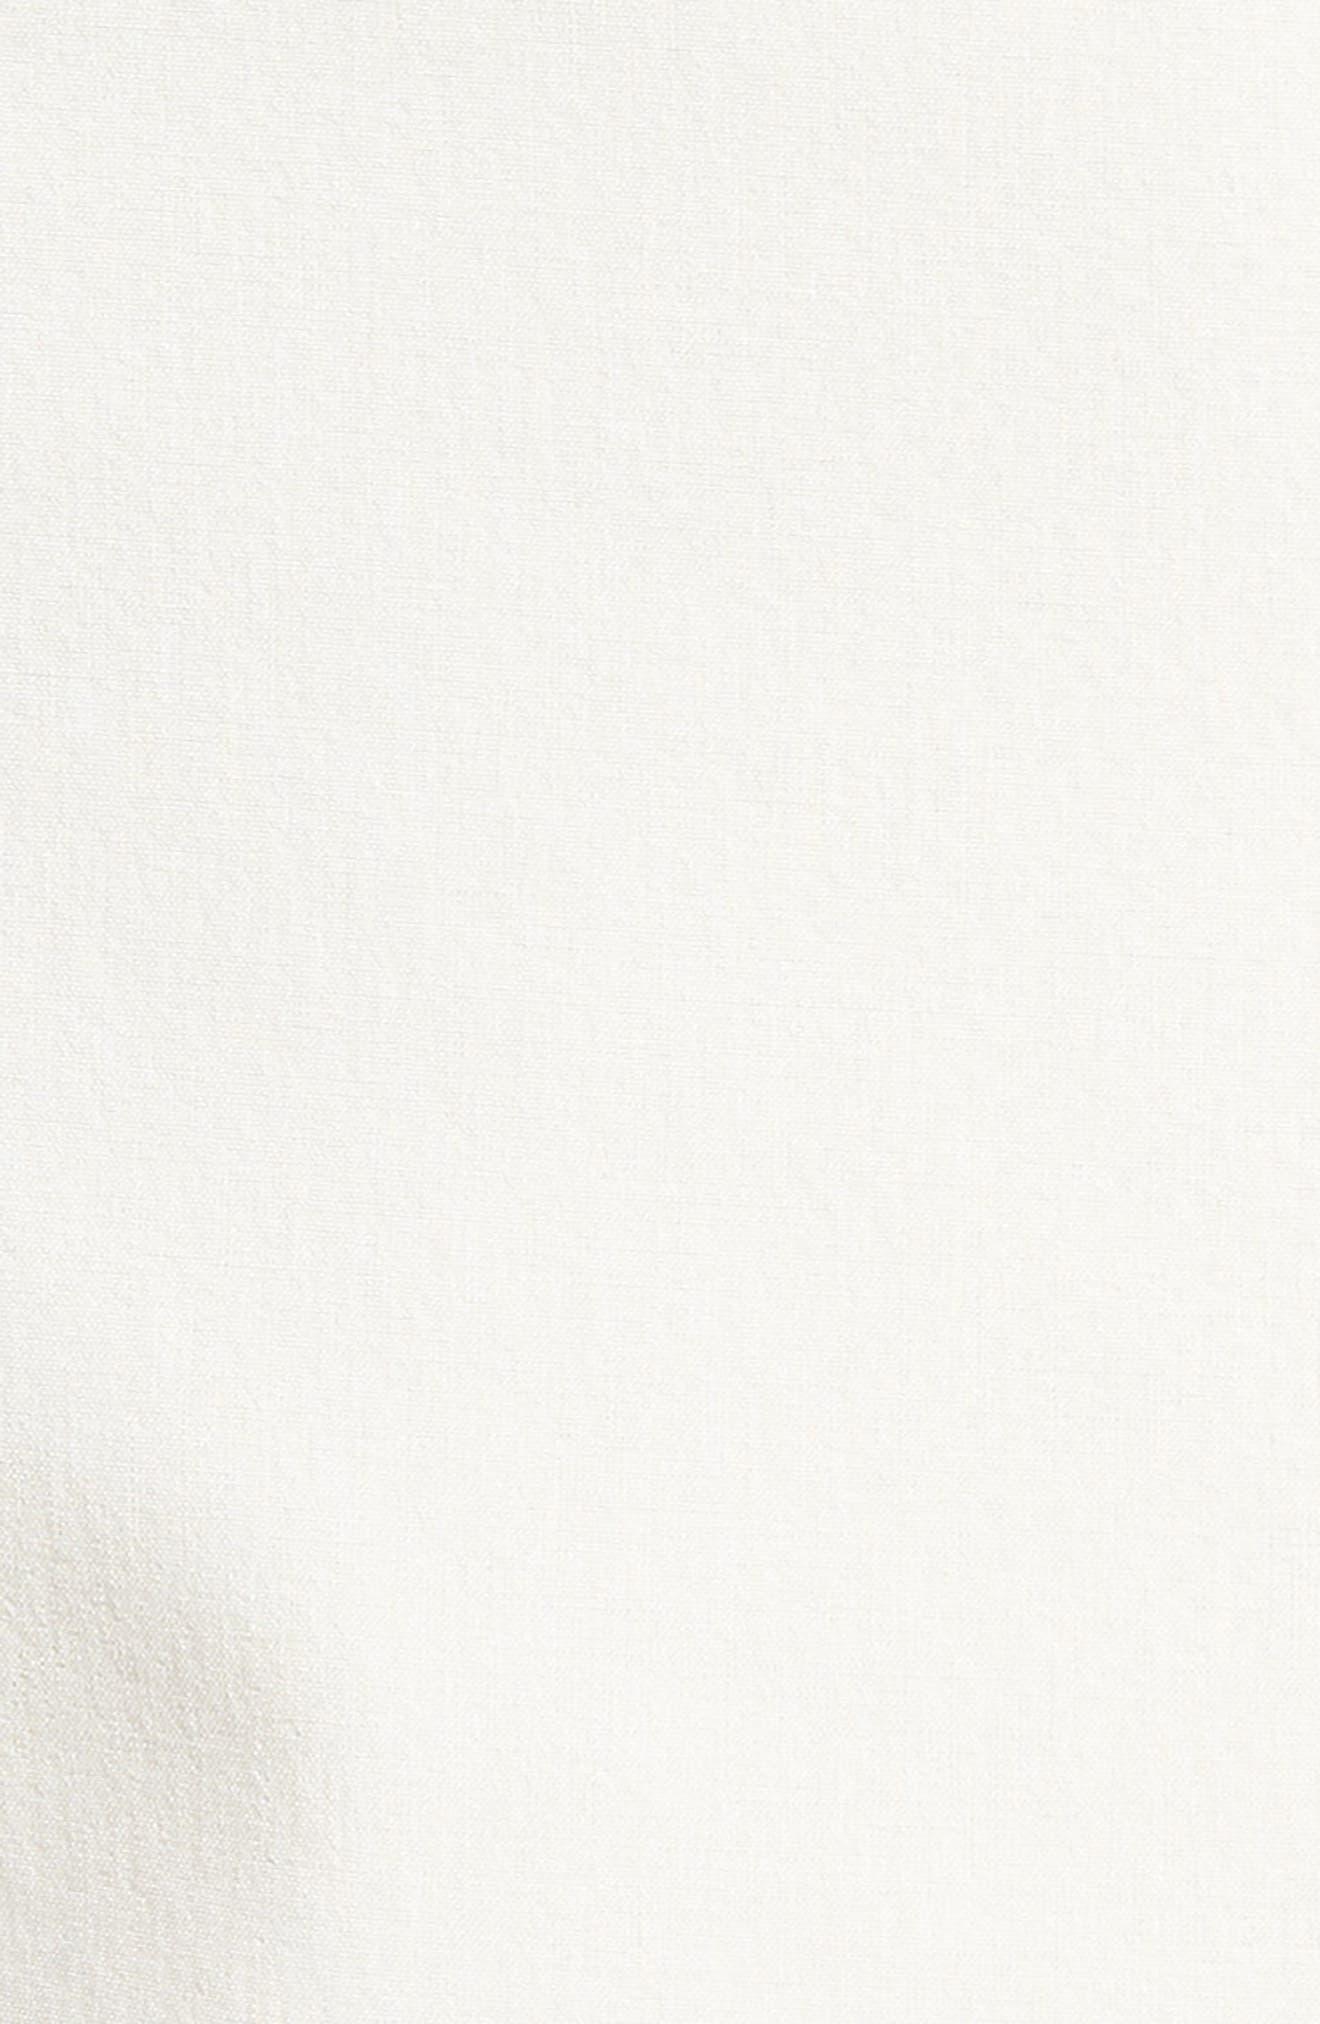 BJ Penn Legend Shorts,                             Alternate thumbnail 5, color,                             WHITE